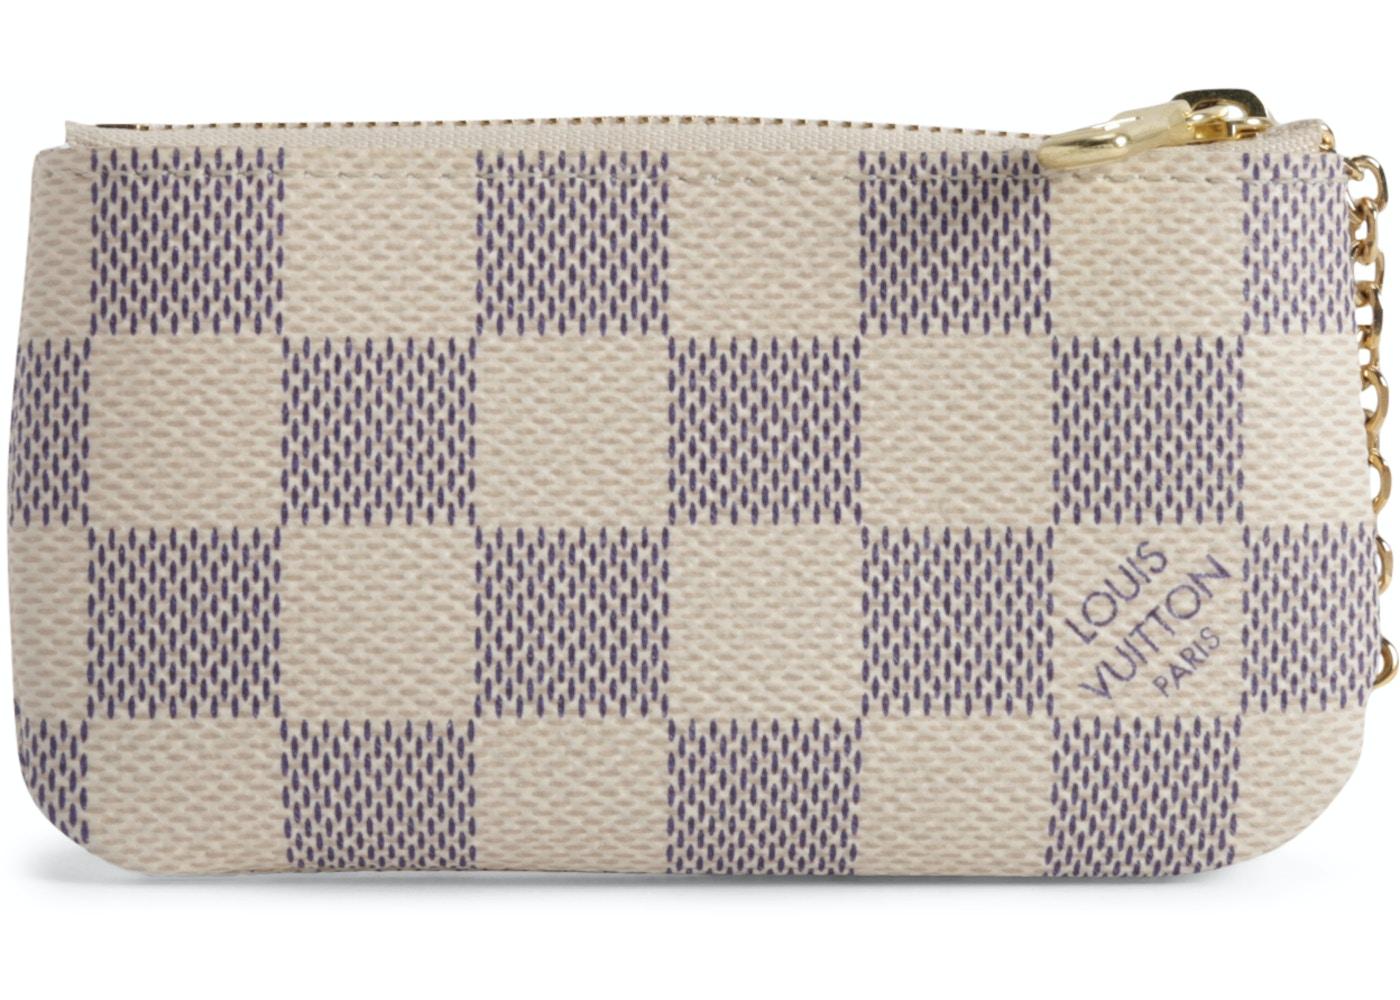 a22990a891fc Buy   Sell Louis Vuitton Luxury Handbags